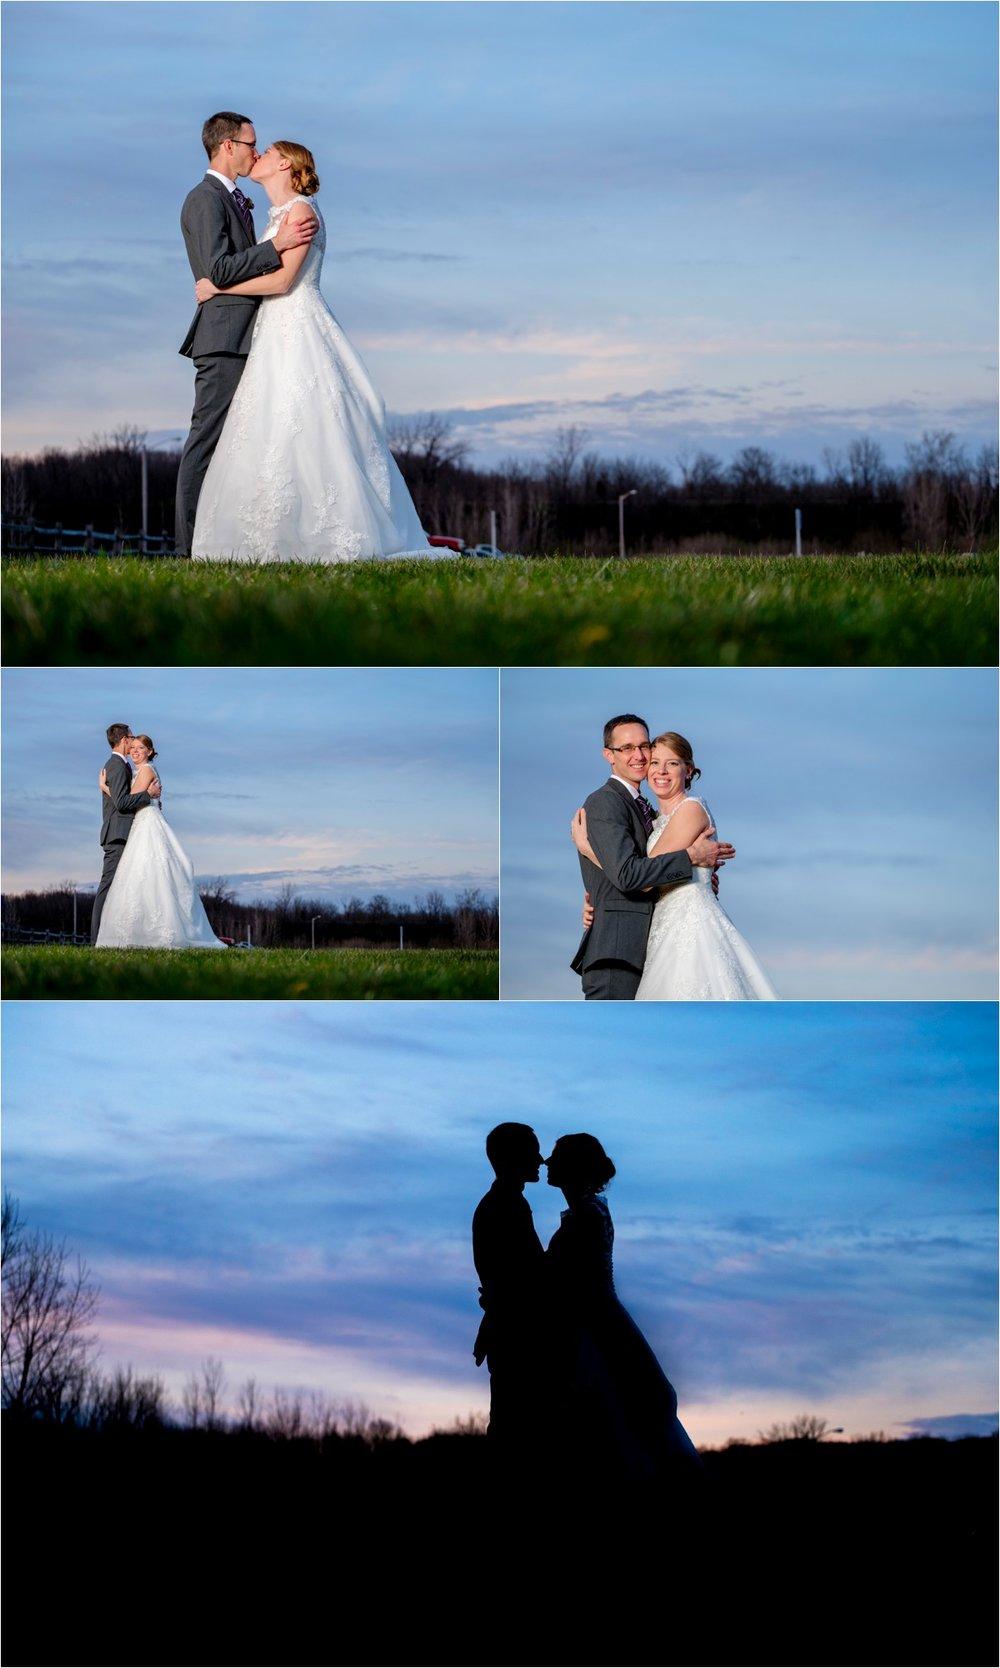 Plainfield-Christian-Church-Washington-Township-Park-Pavilion-Wedding-Pictures_0028.jpg